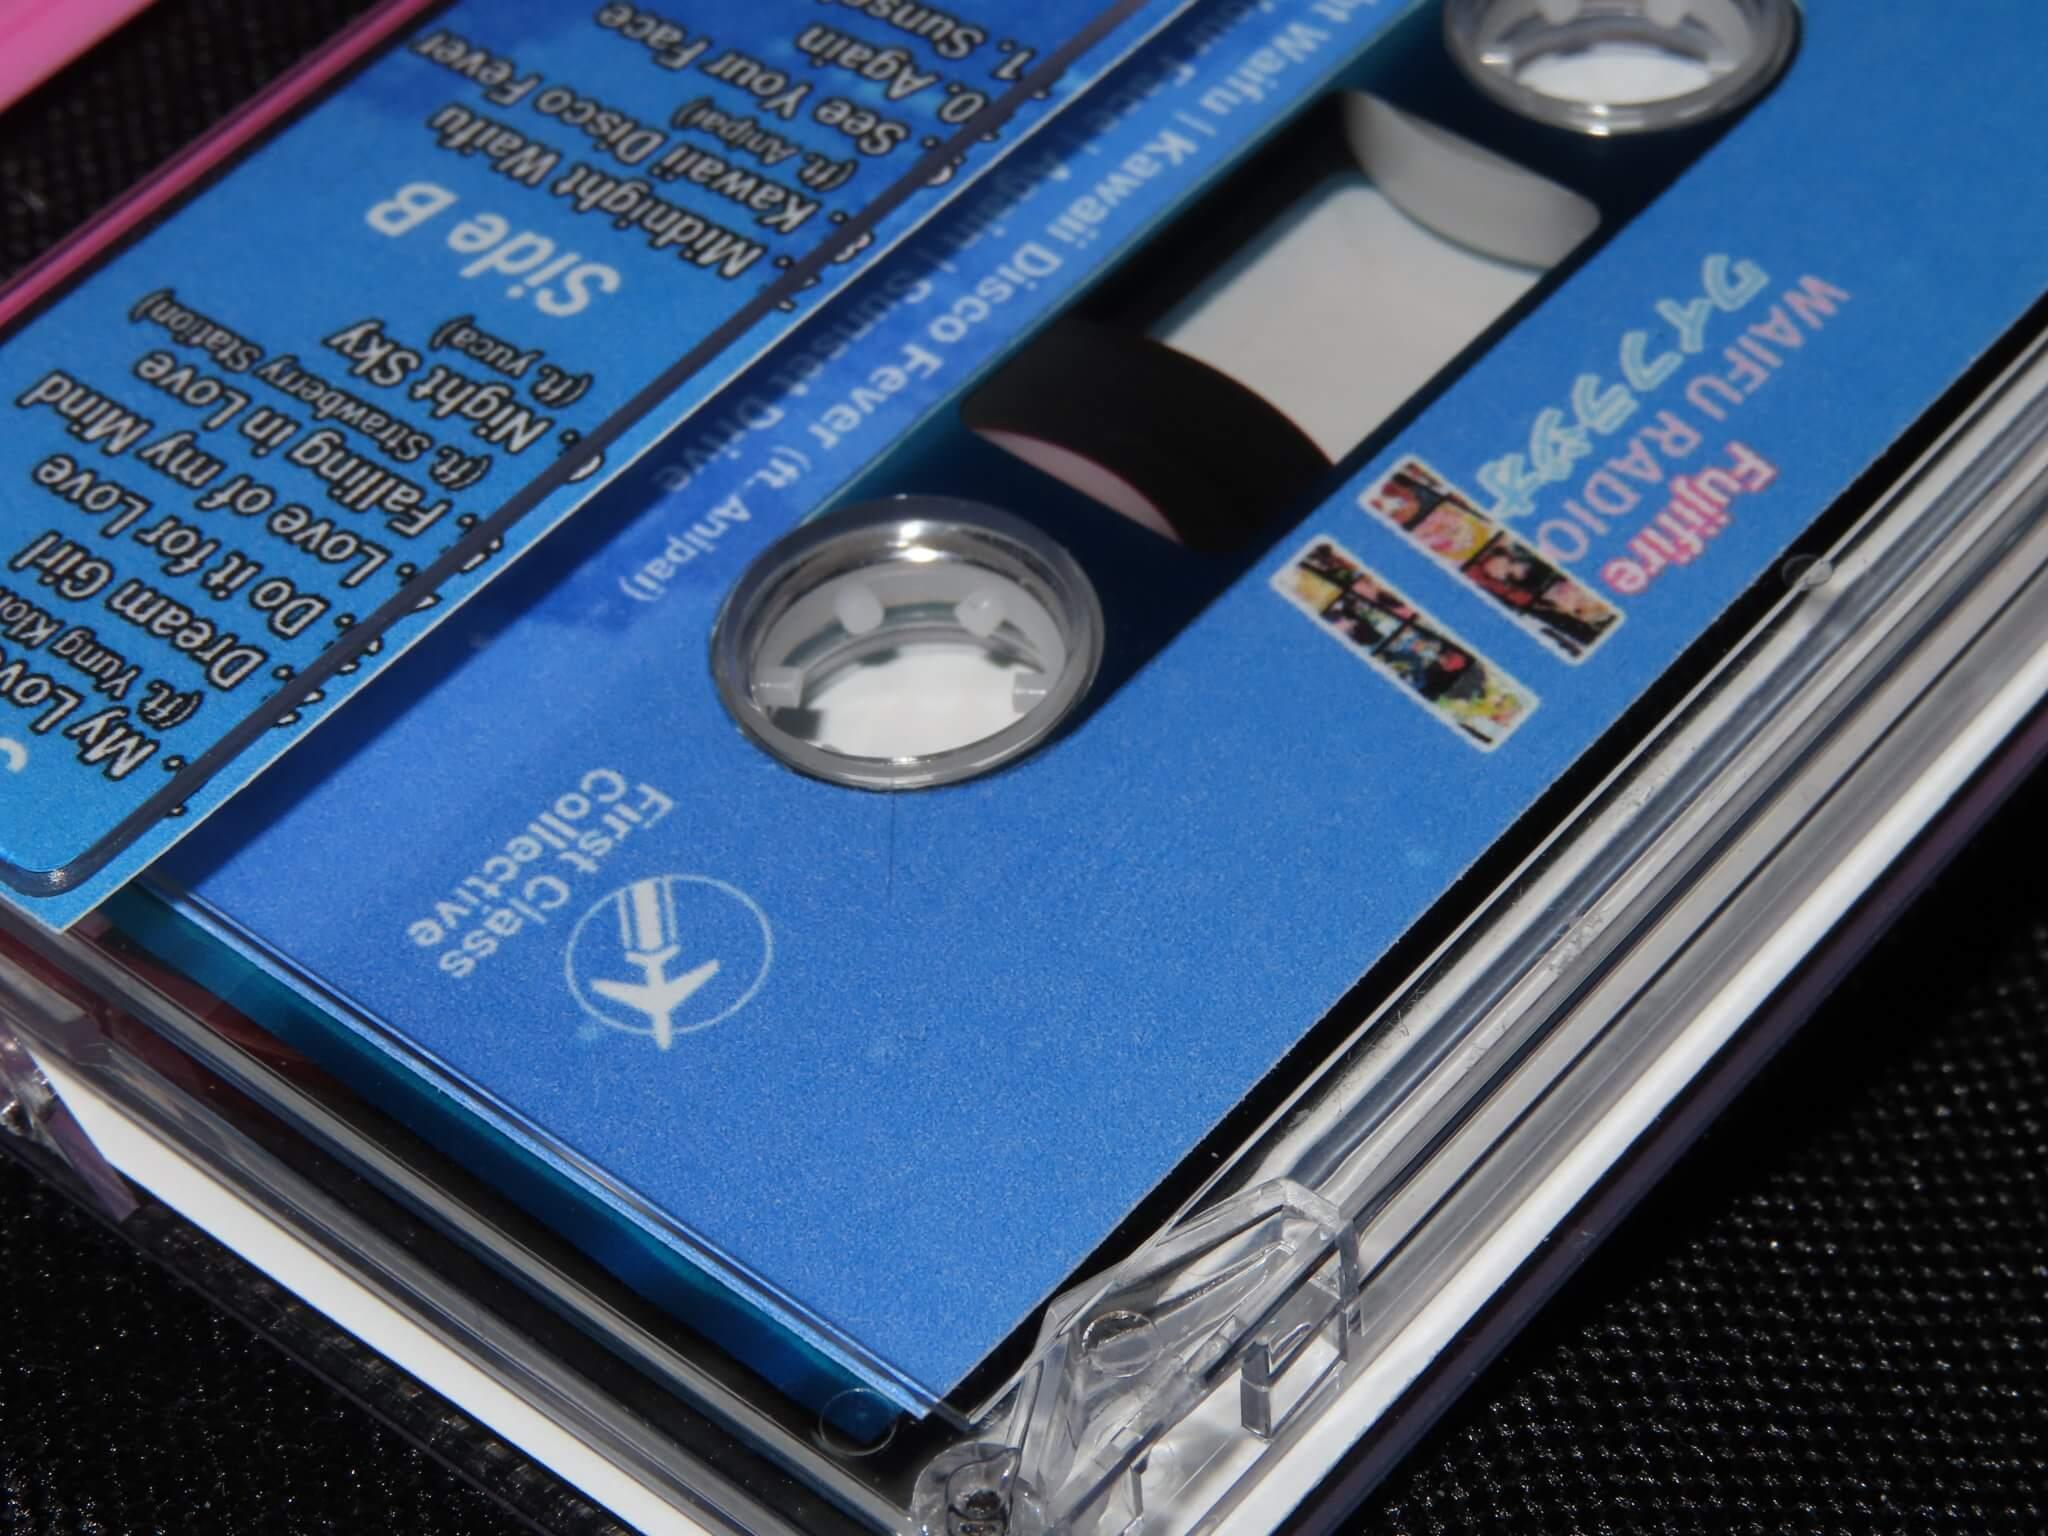 Waifu Radio 2 by Fujifire Review (Cassette) 4